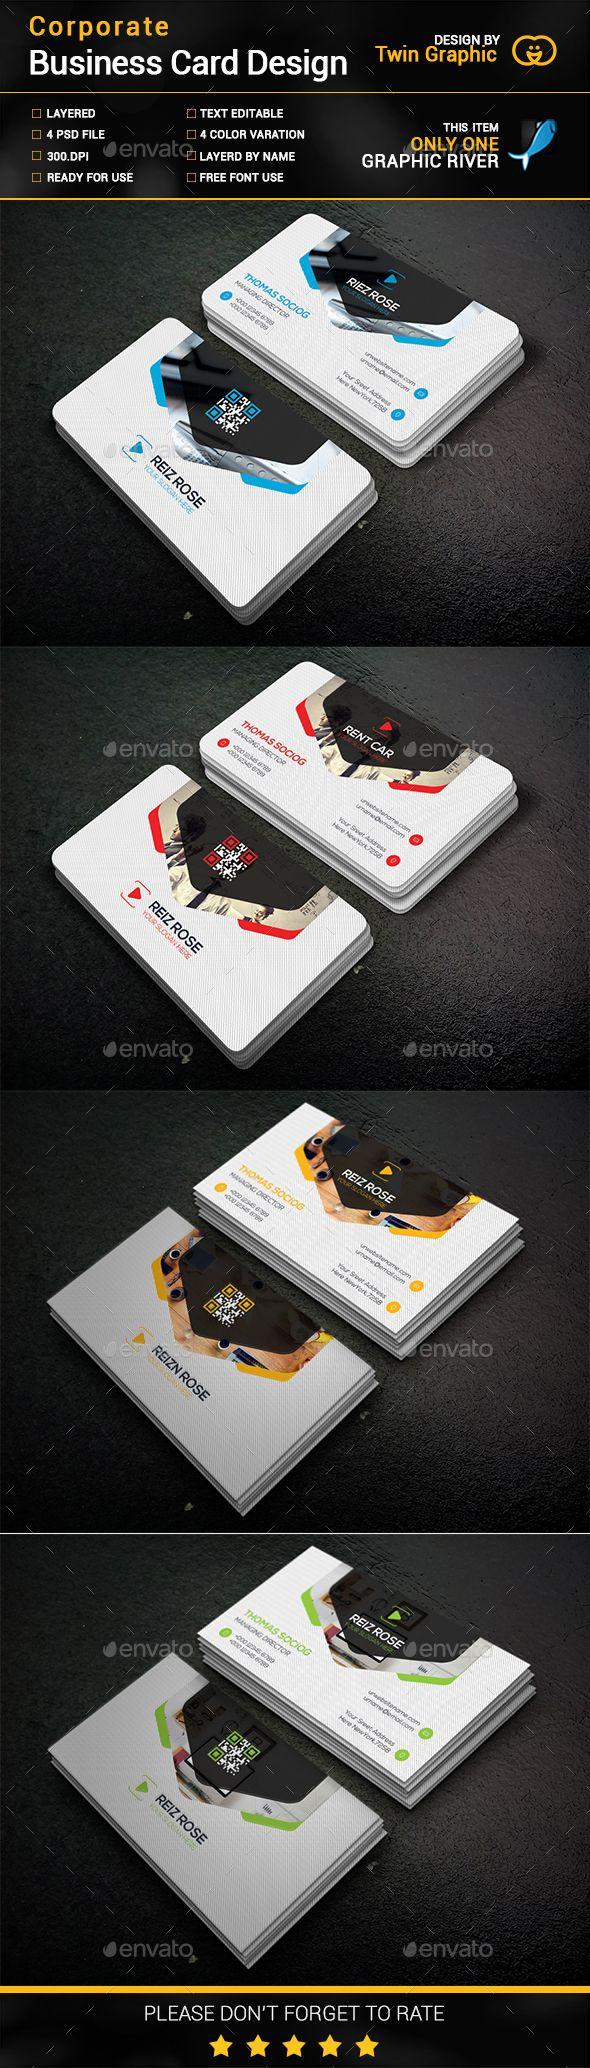 336 best fl business cards images on pinterest business card corporate business card design reheart Images